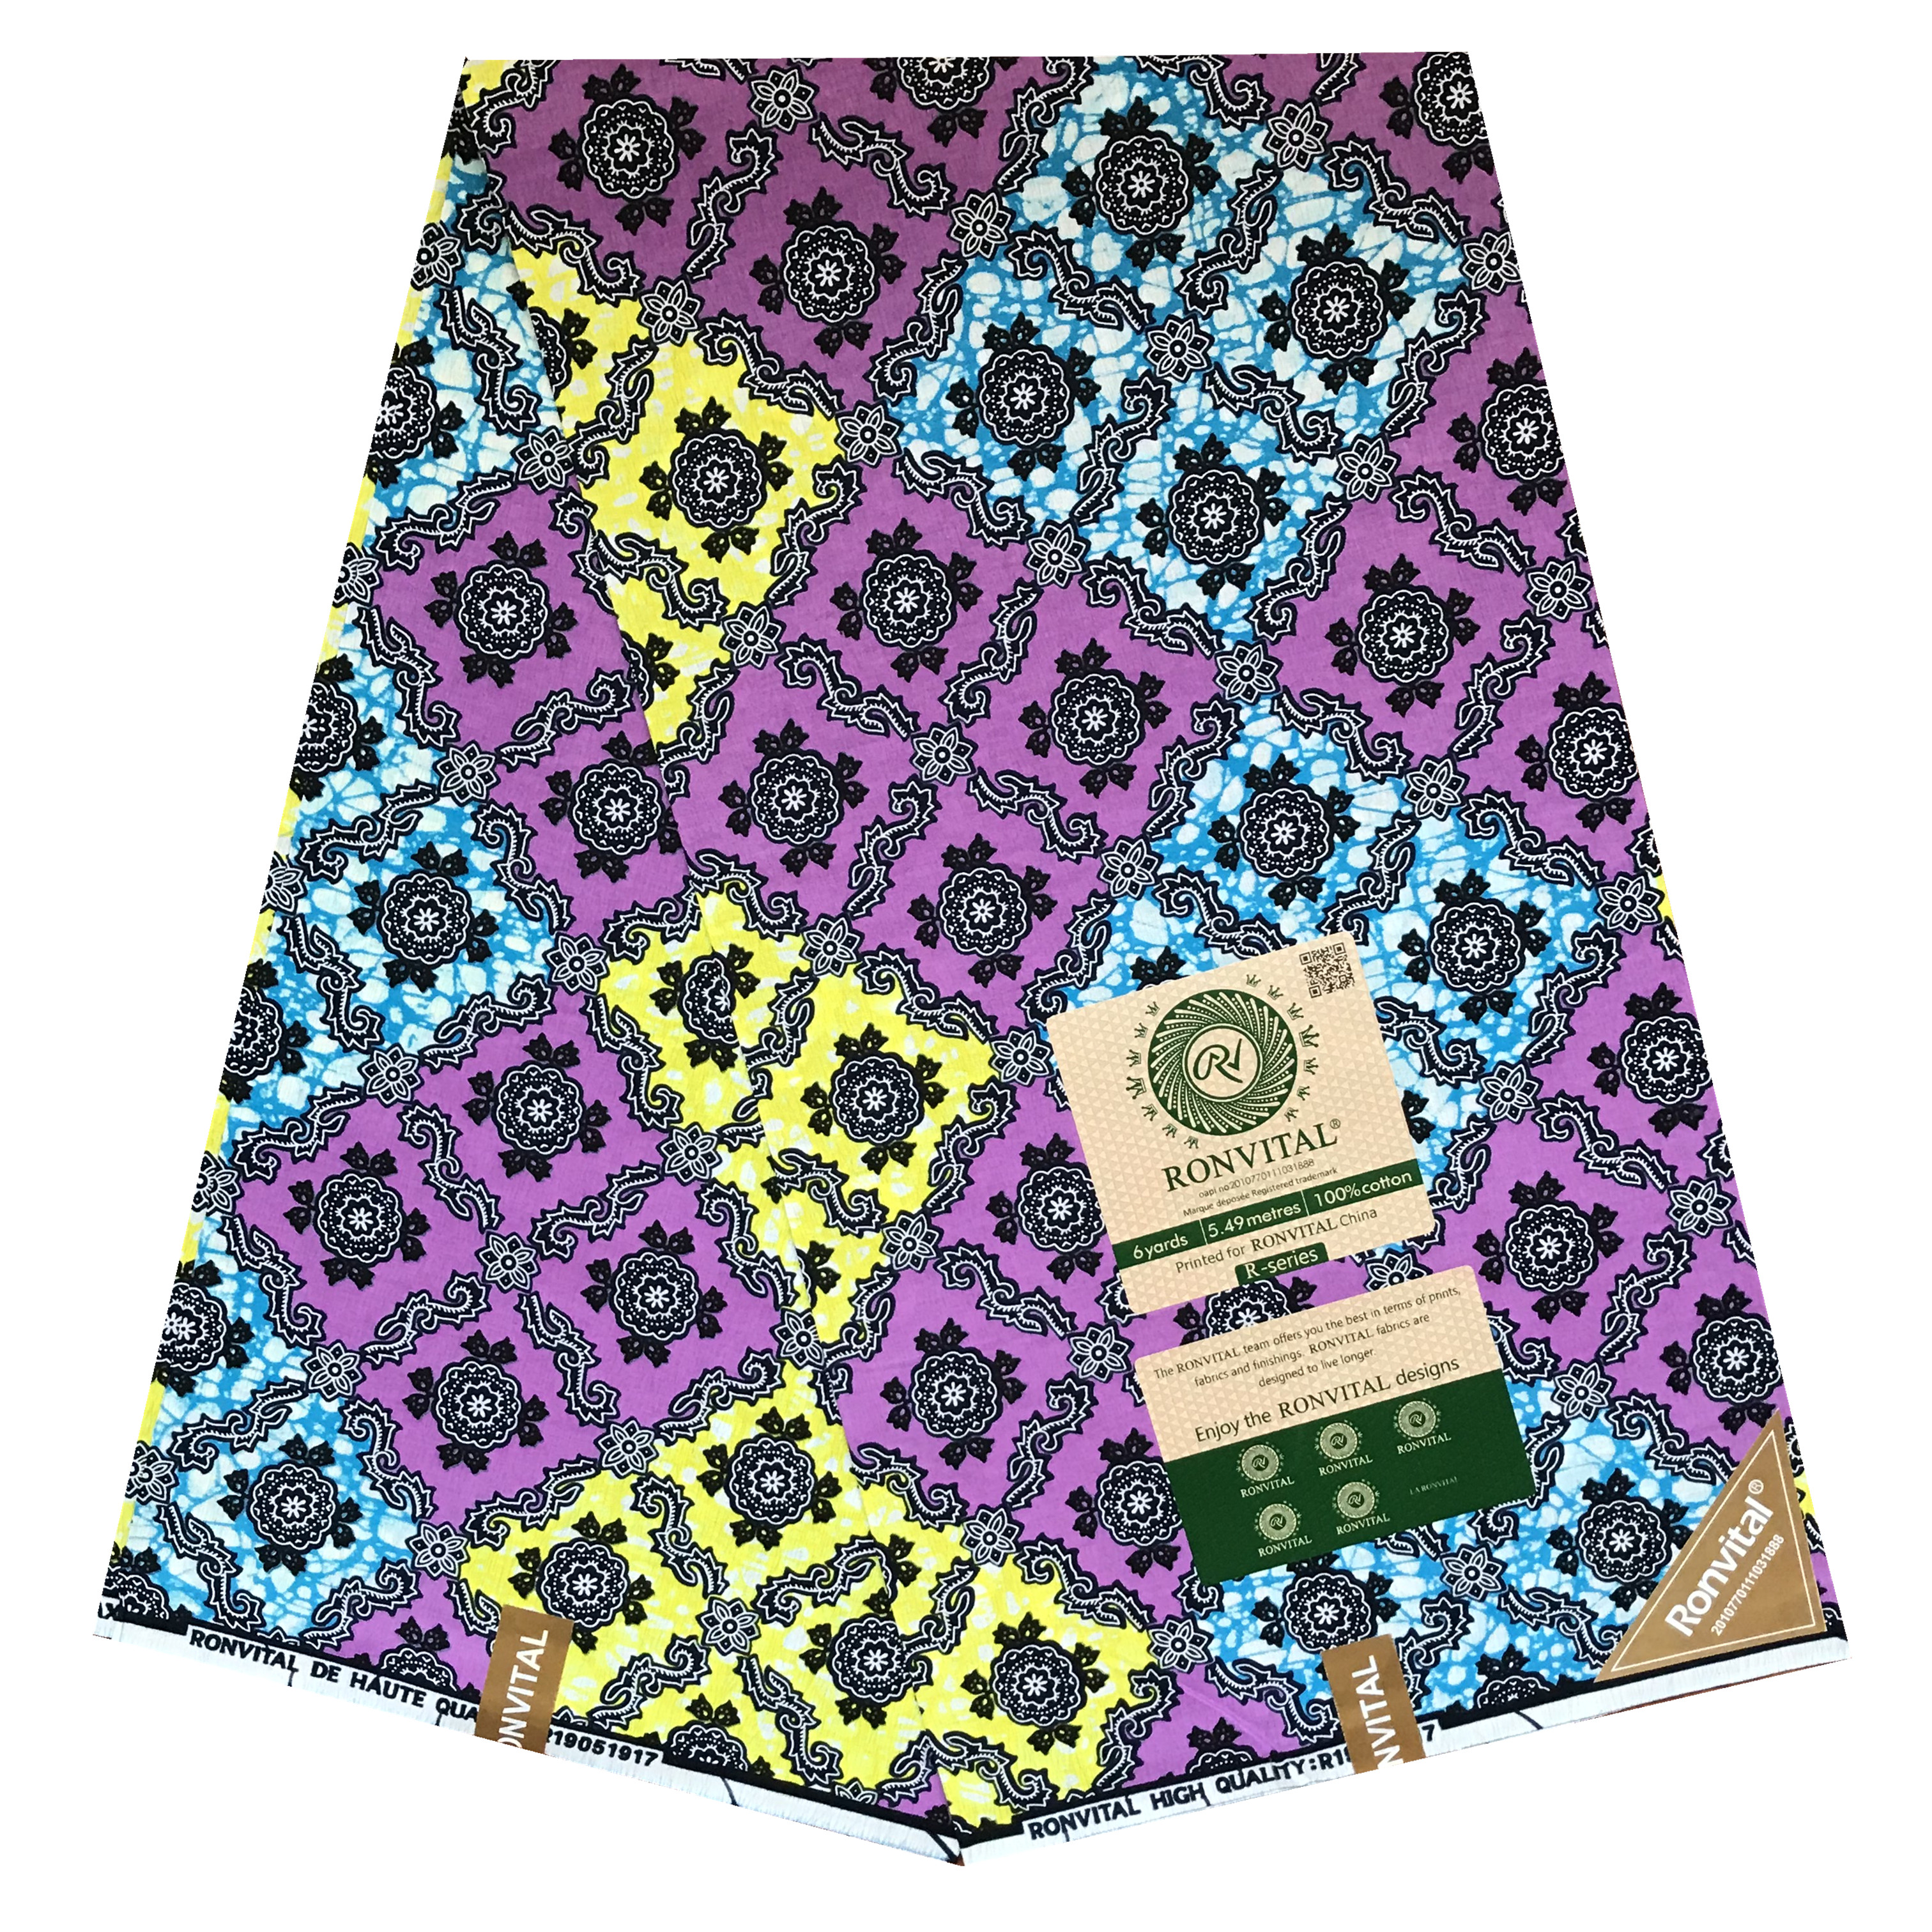 African Dutch Wax Ankara Fabric 2020 Latest African Fabric Print Dutch Veritable 100% Cotton Pagne Africain Hot Wax